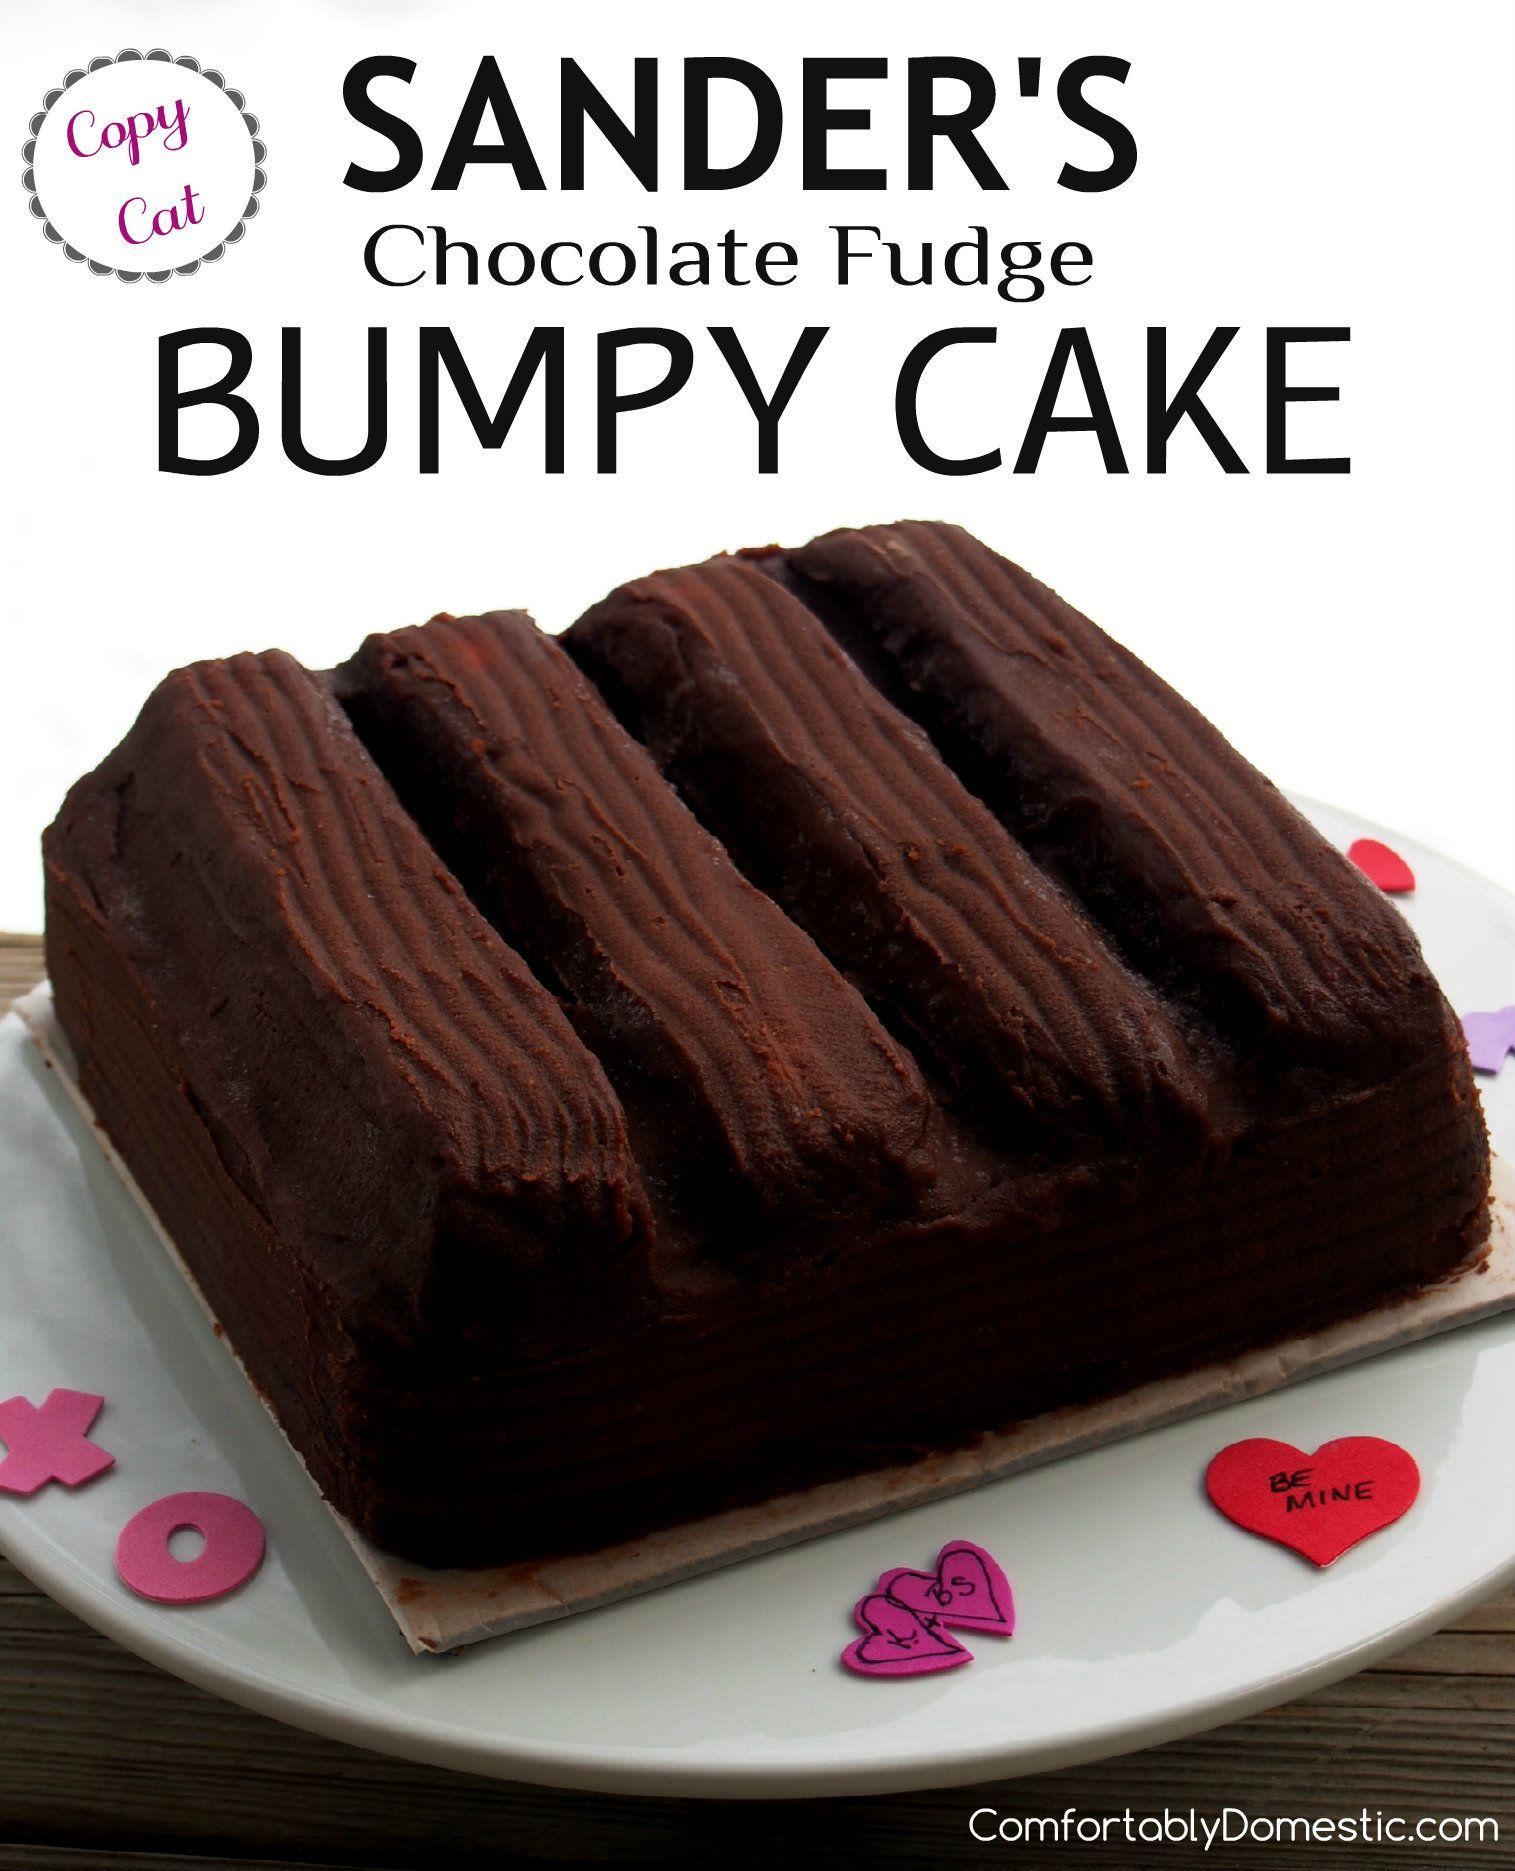 Chocolate Fudge Bumpy Cake (Copycat Sanders Bumpy Cake)   Recipe ...